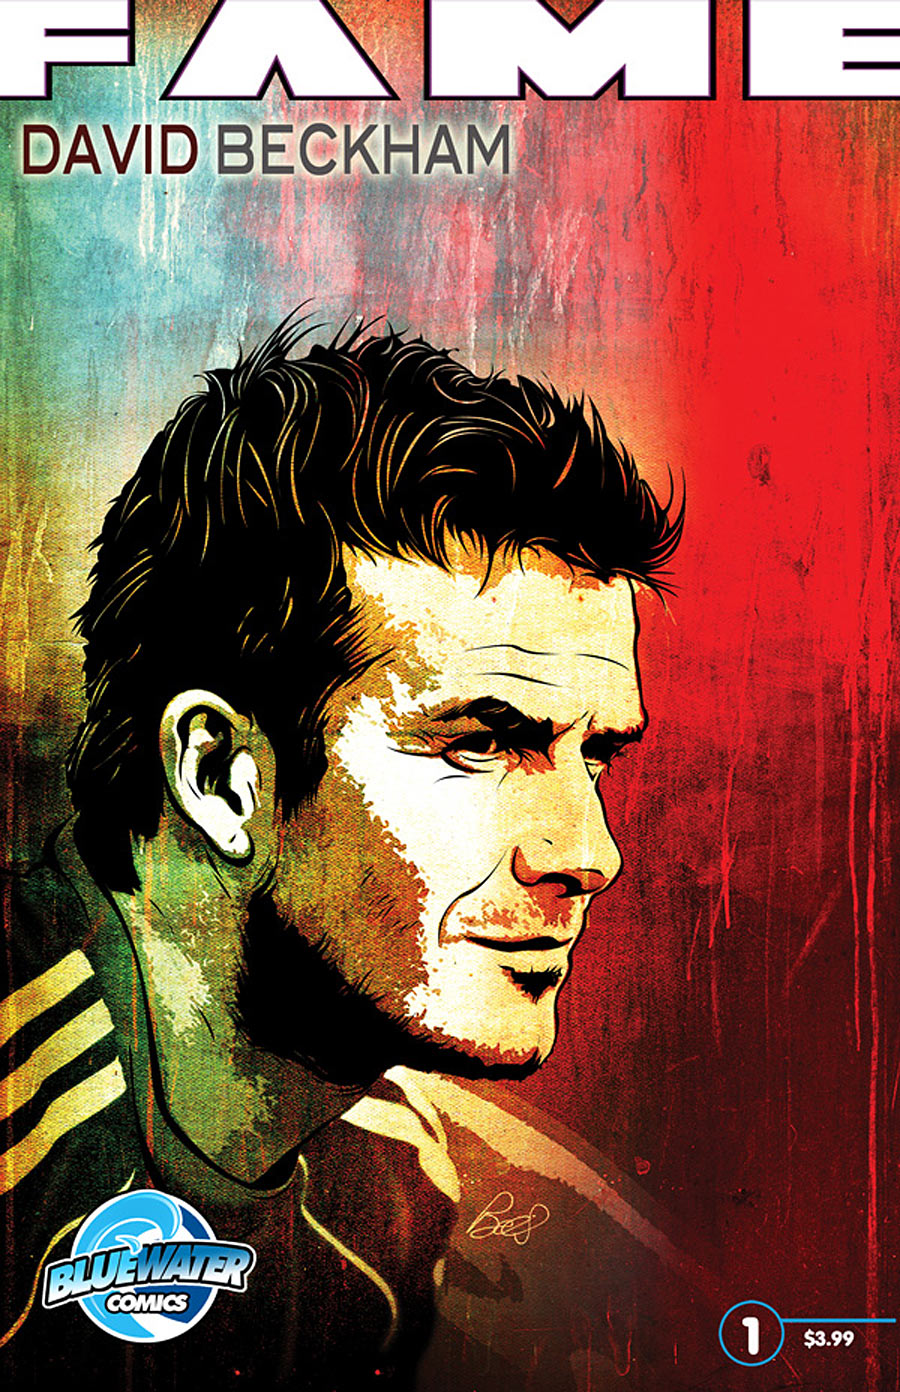 fame_beckham David Beckham earns latest Bluewater biography